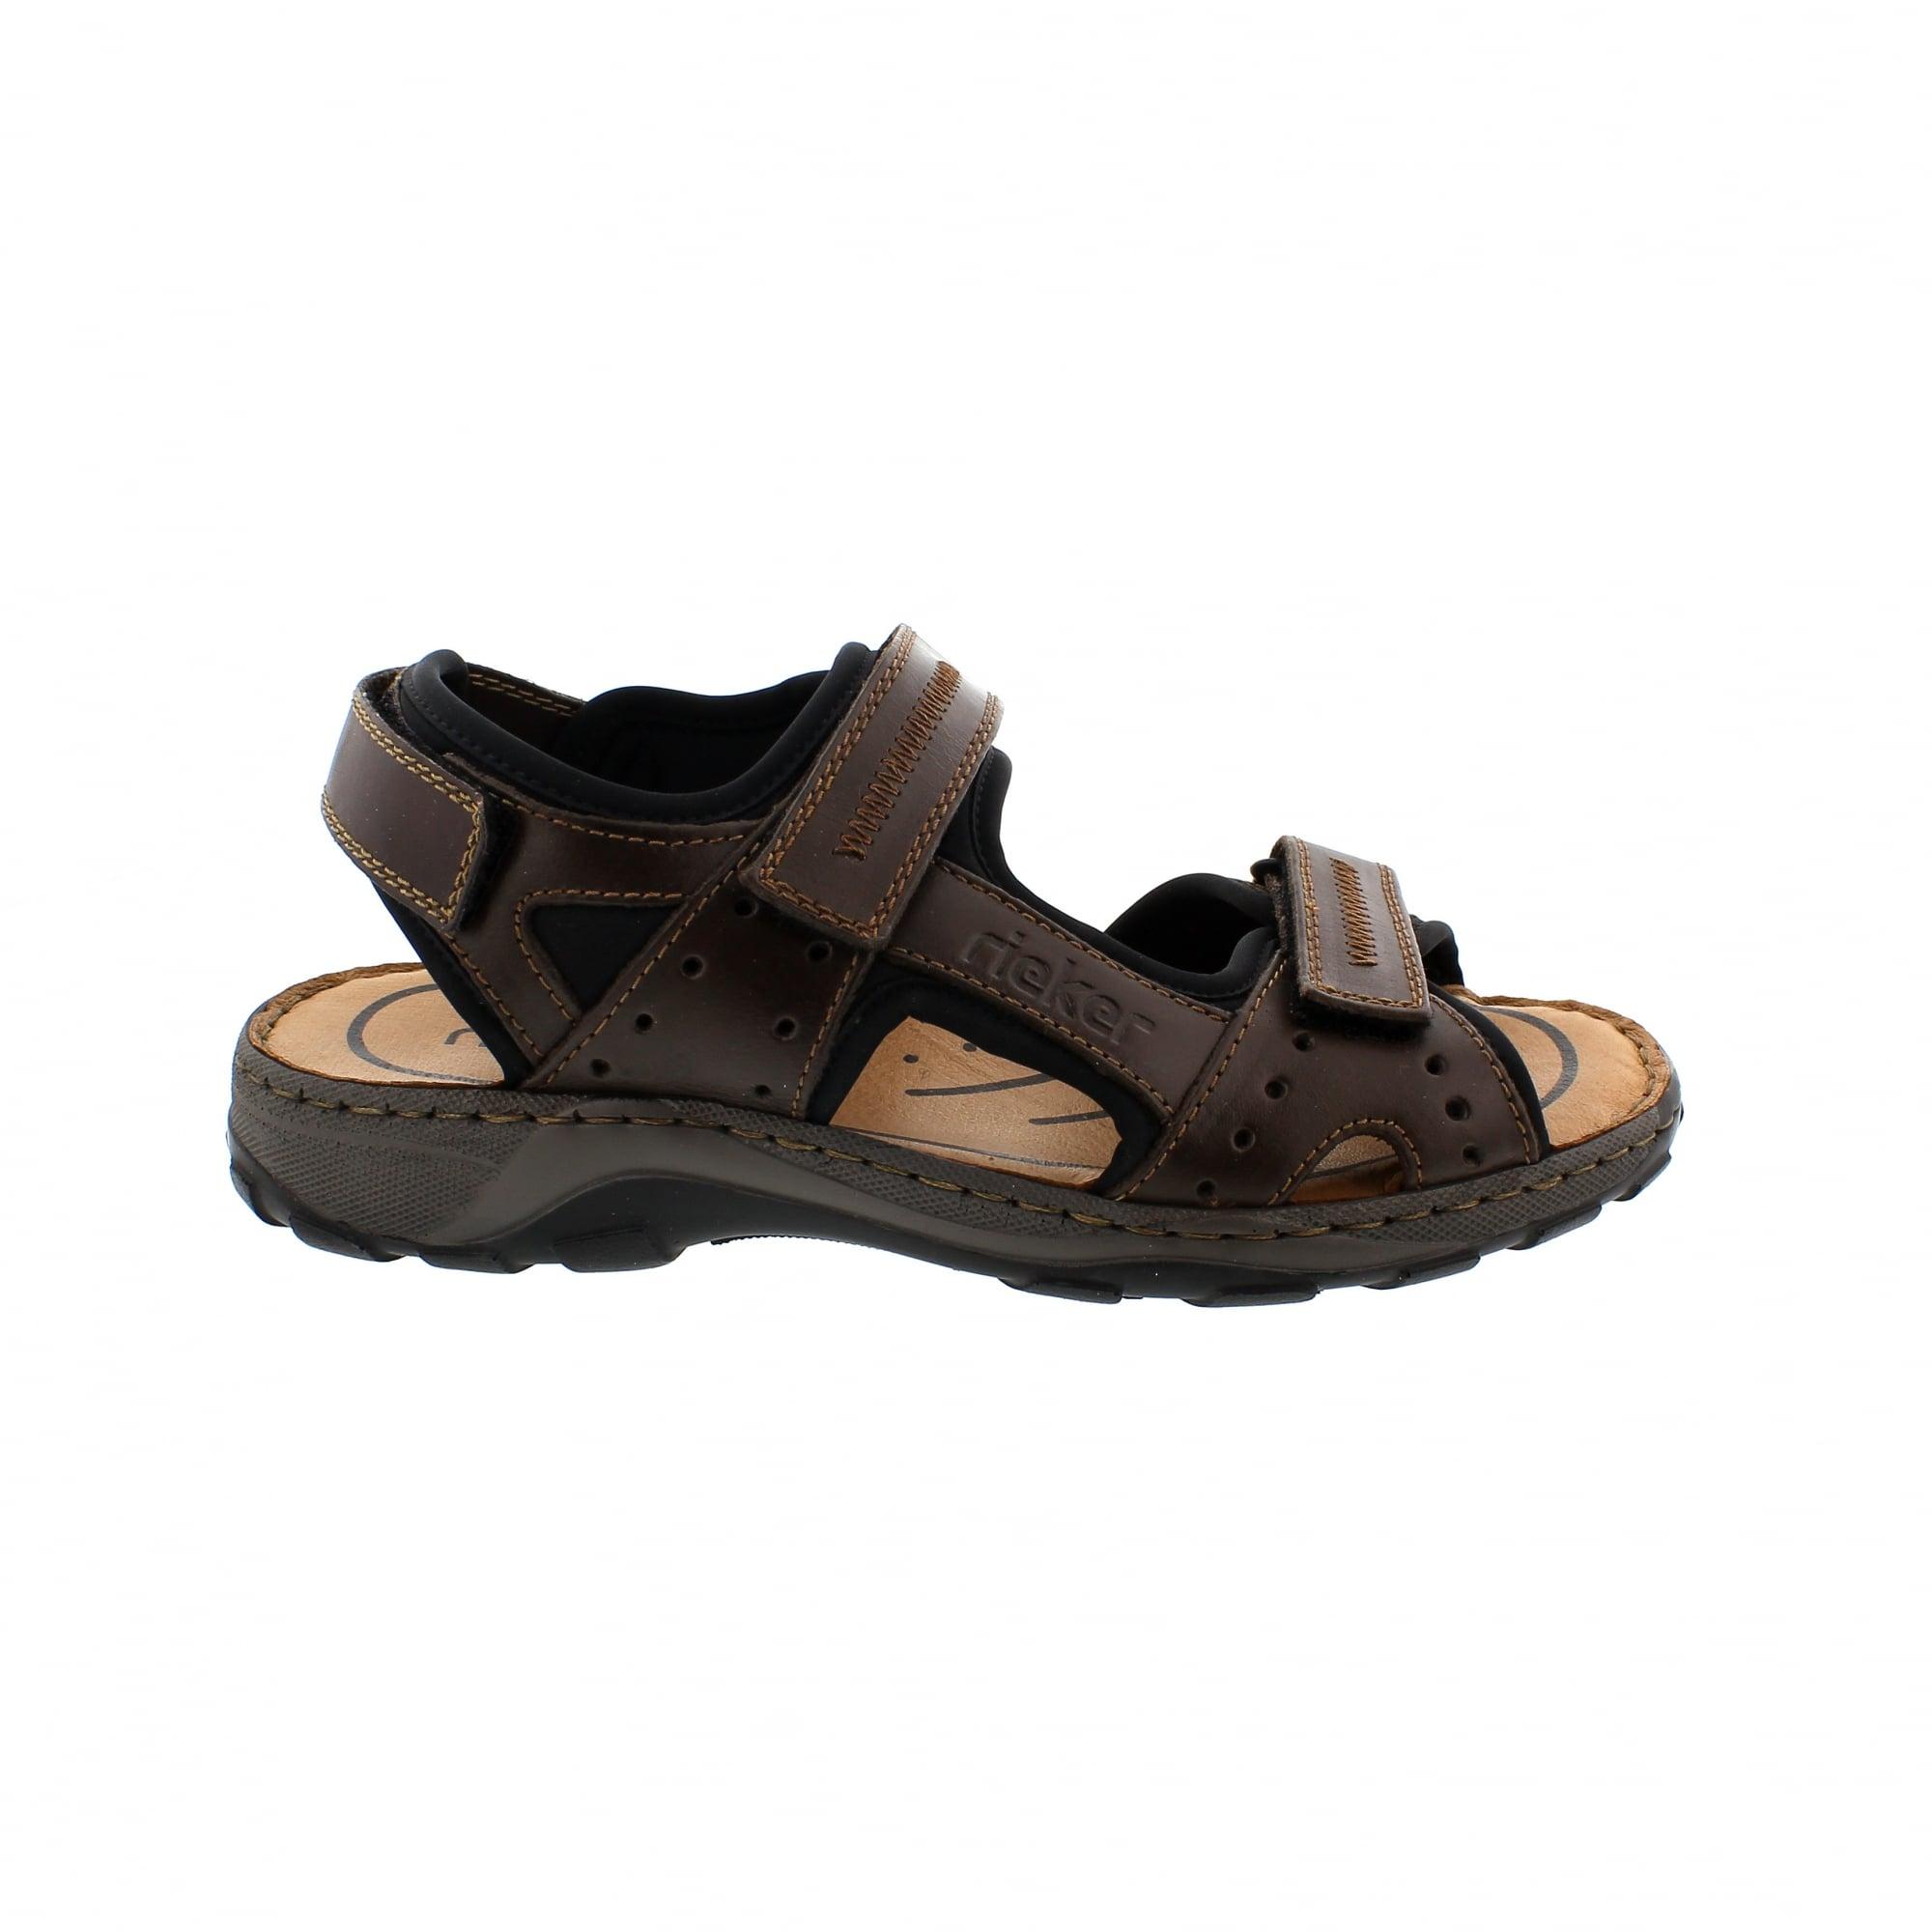 18f8d22550cf Rieker 26061-25 Brown Leather Mens Walking Sandals